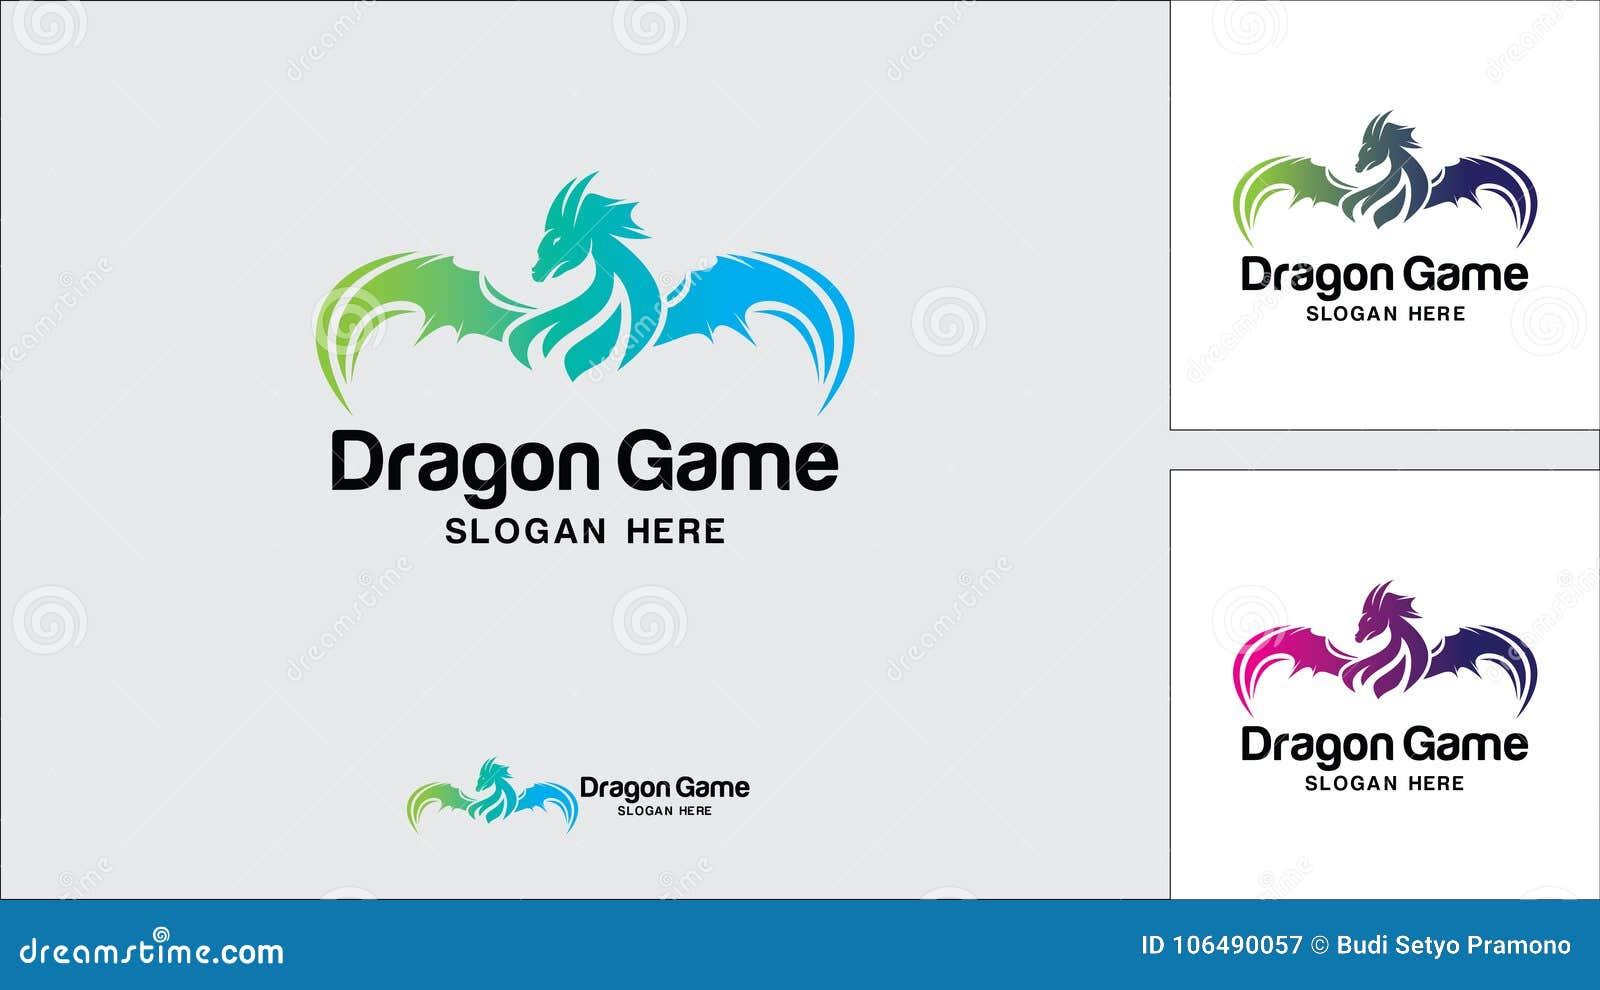 Calibre de conception de logo de dragon, illustration de vecteur, logo de jeu